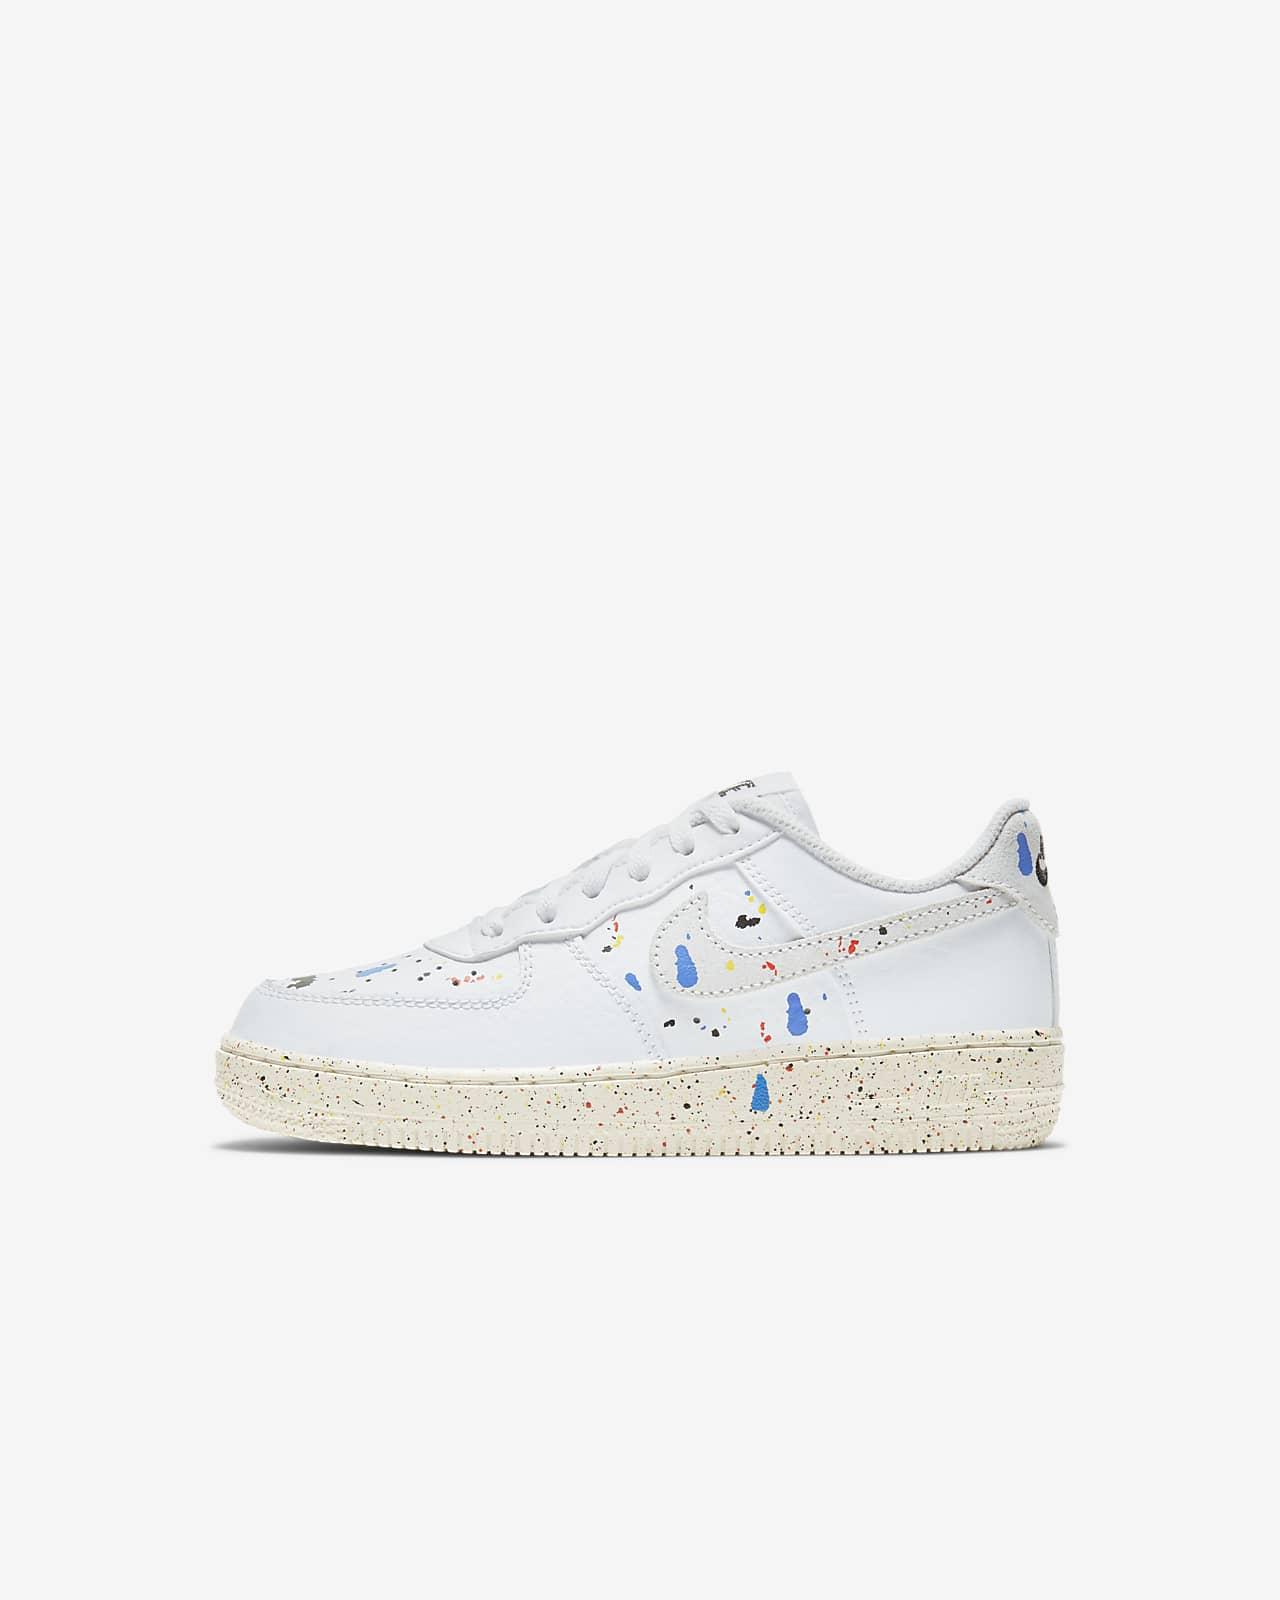 Nike Force 1 LV8 3 (PS) 幼童运动童鞋